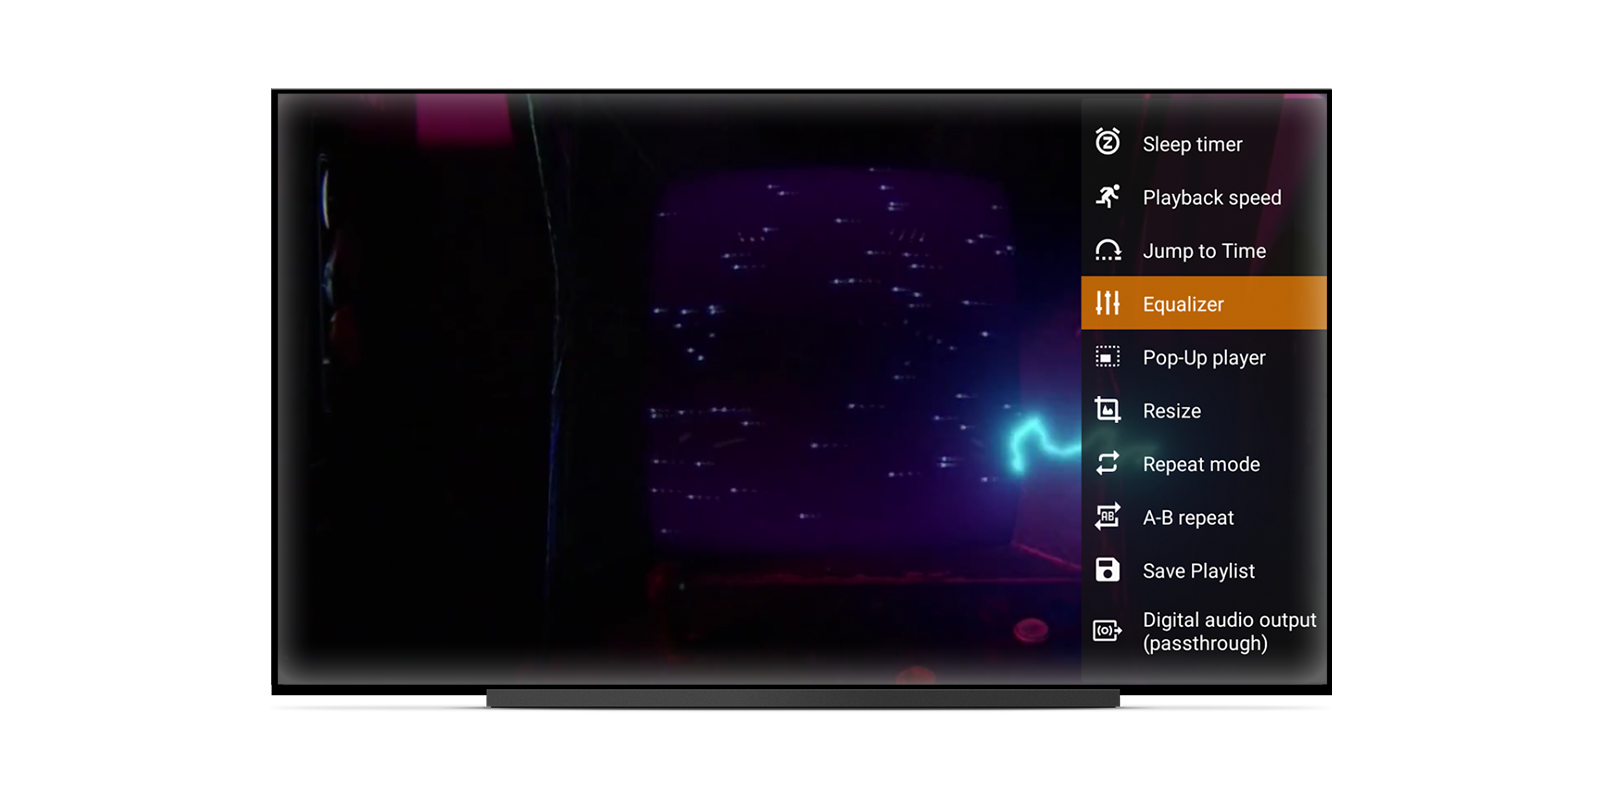 VLC 针对 Android TV 上的大屏幕 Leanback 观看体验进行了优化